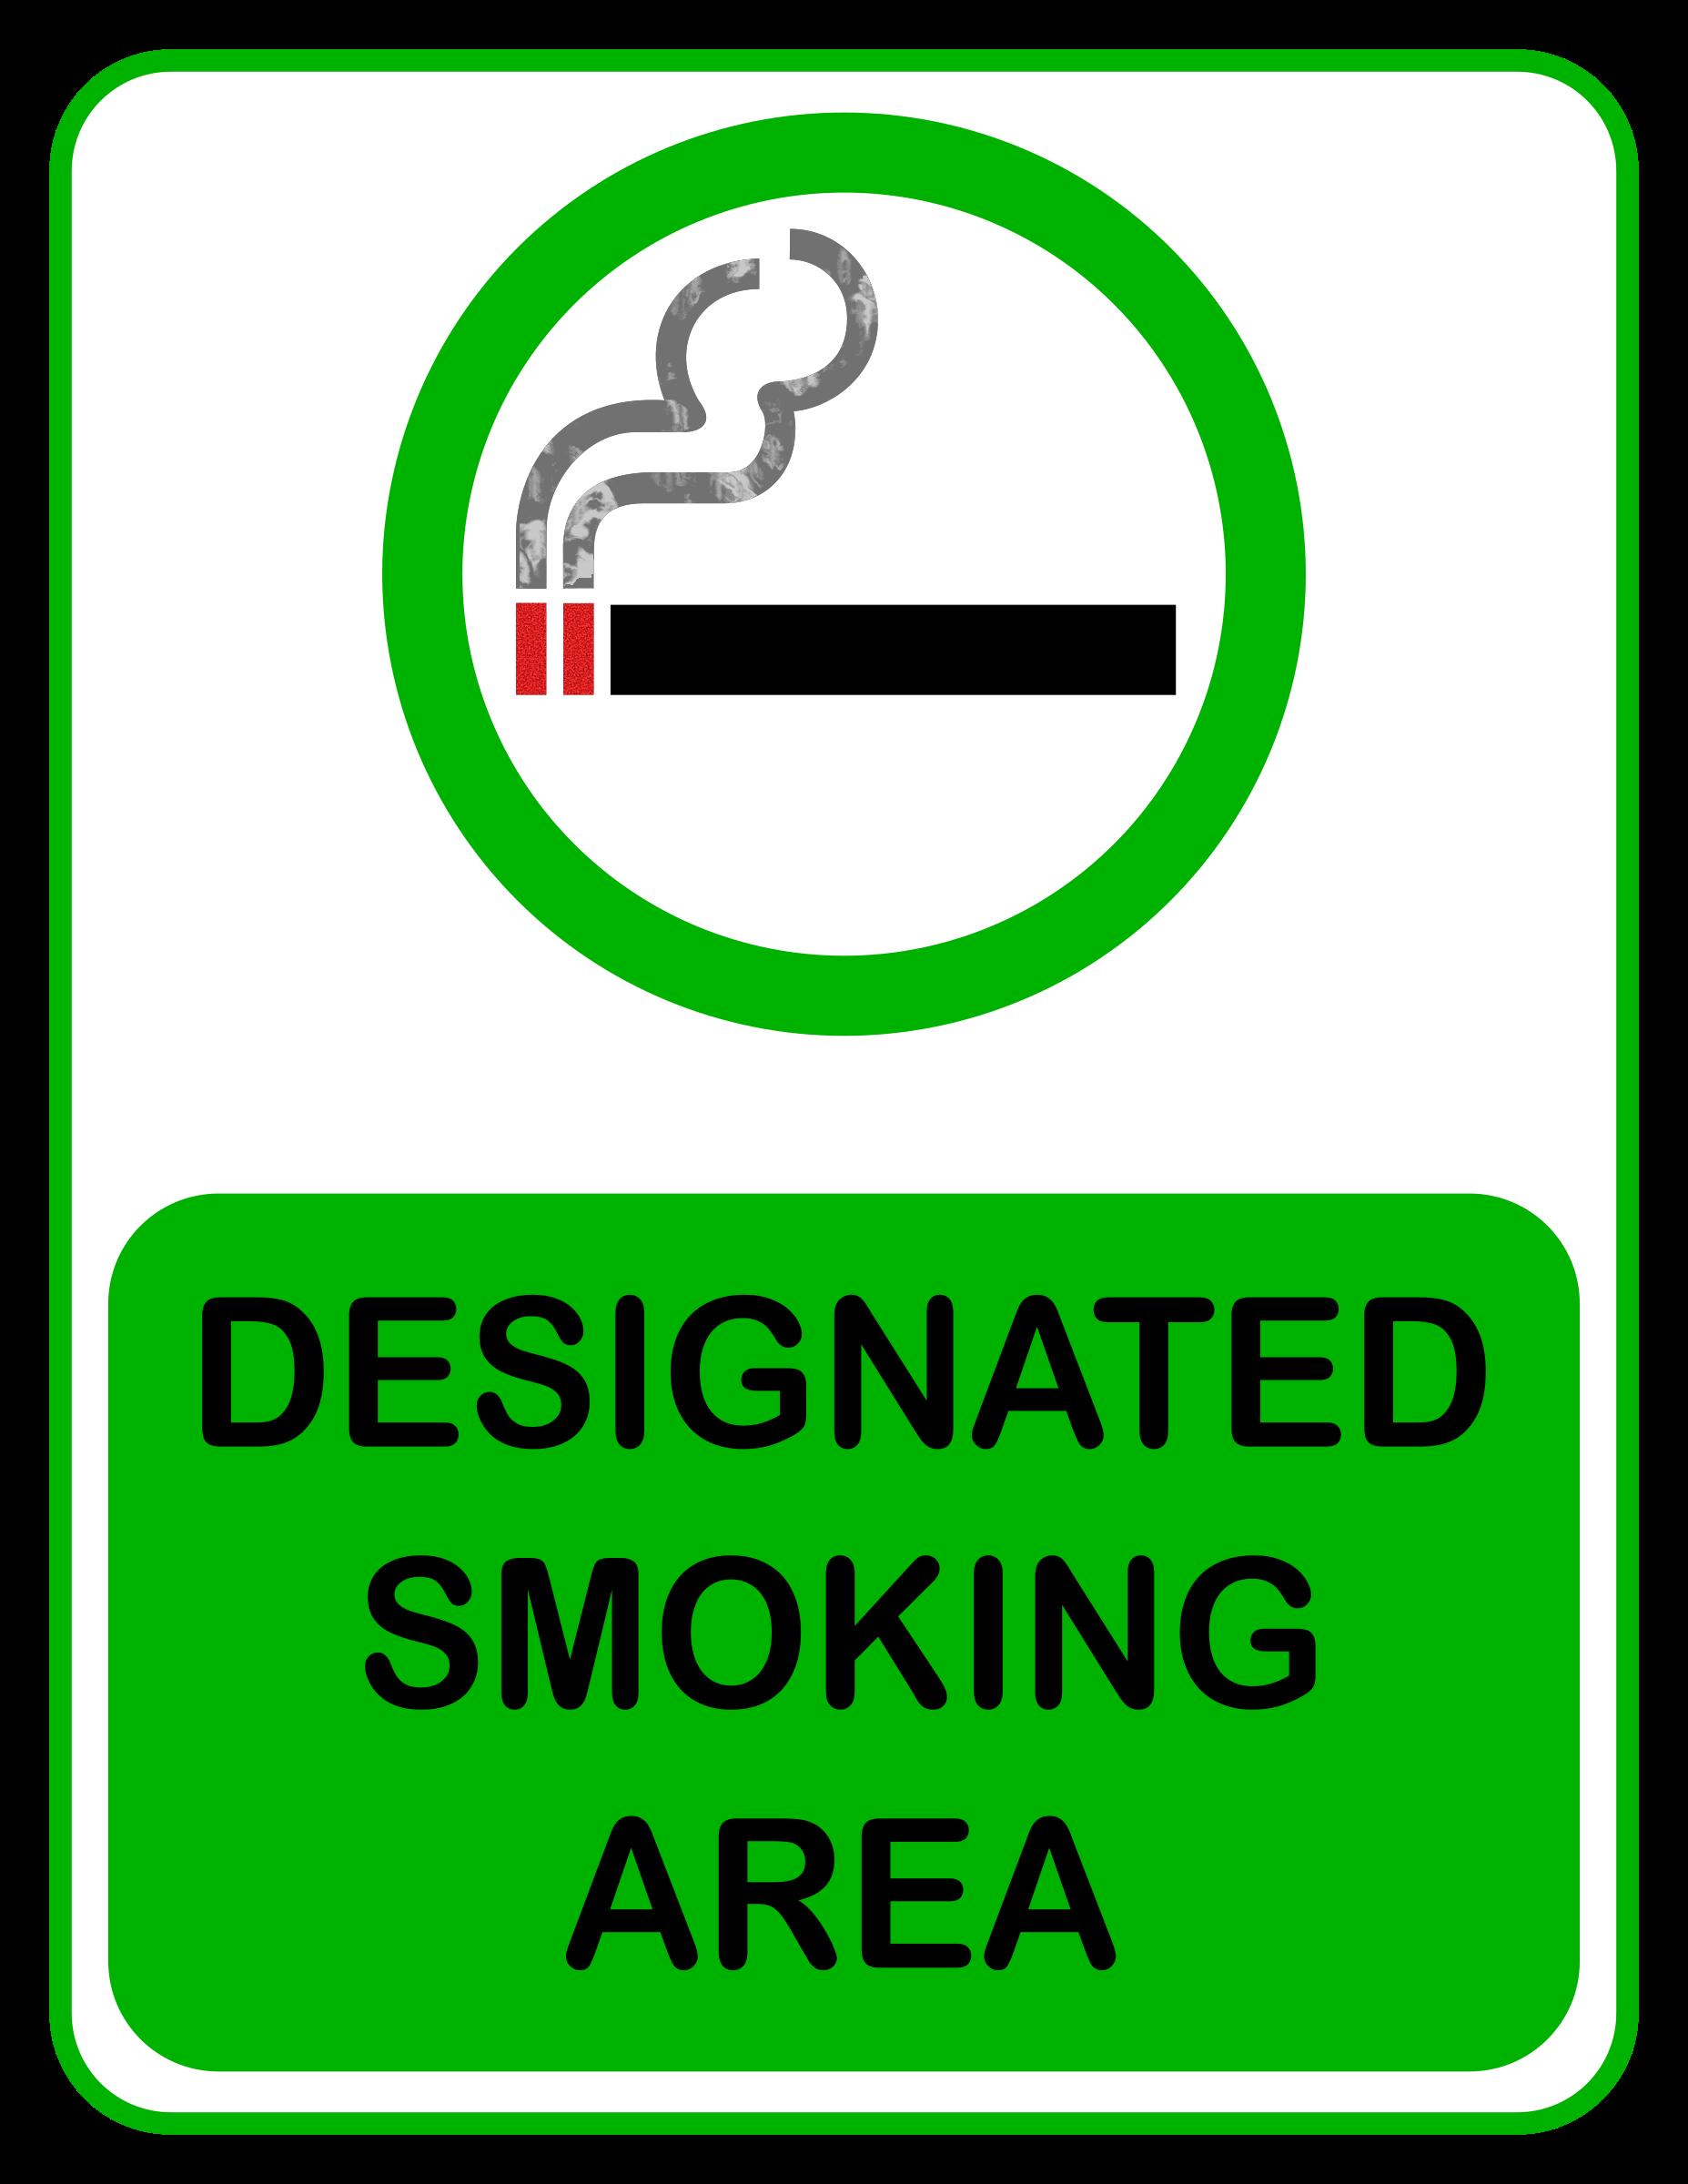 Clipart - Designated Smoking Area